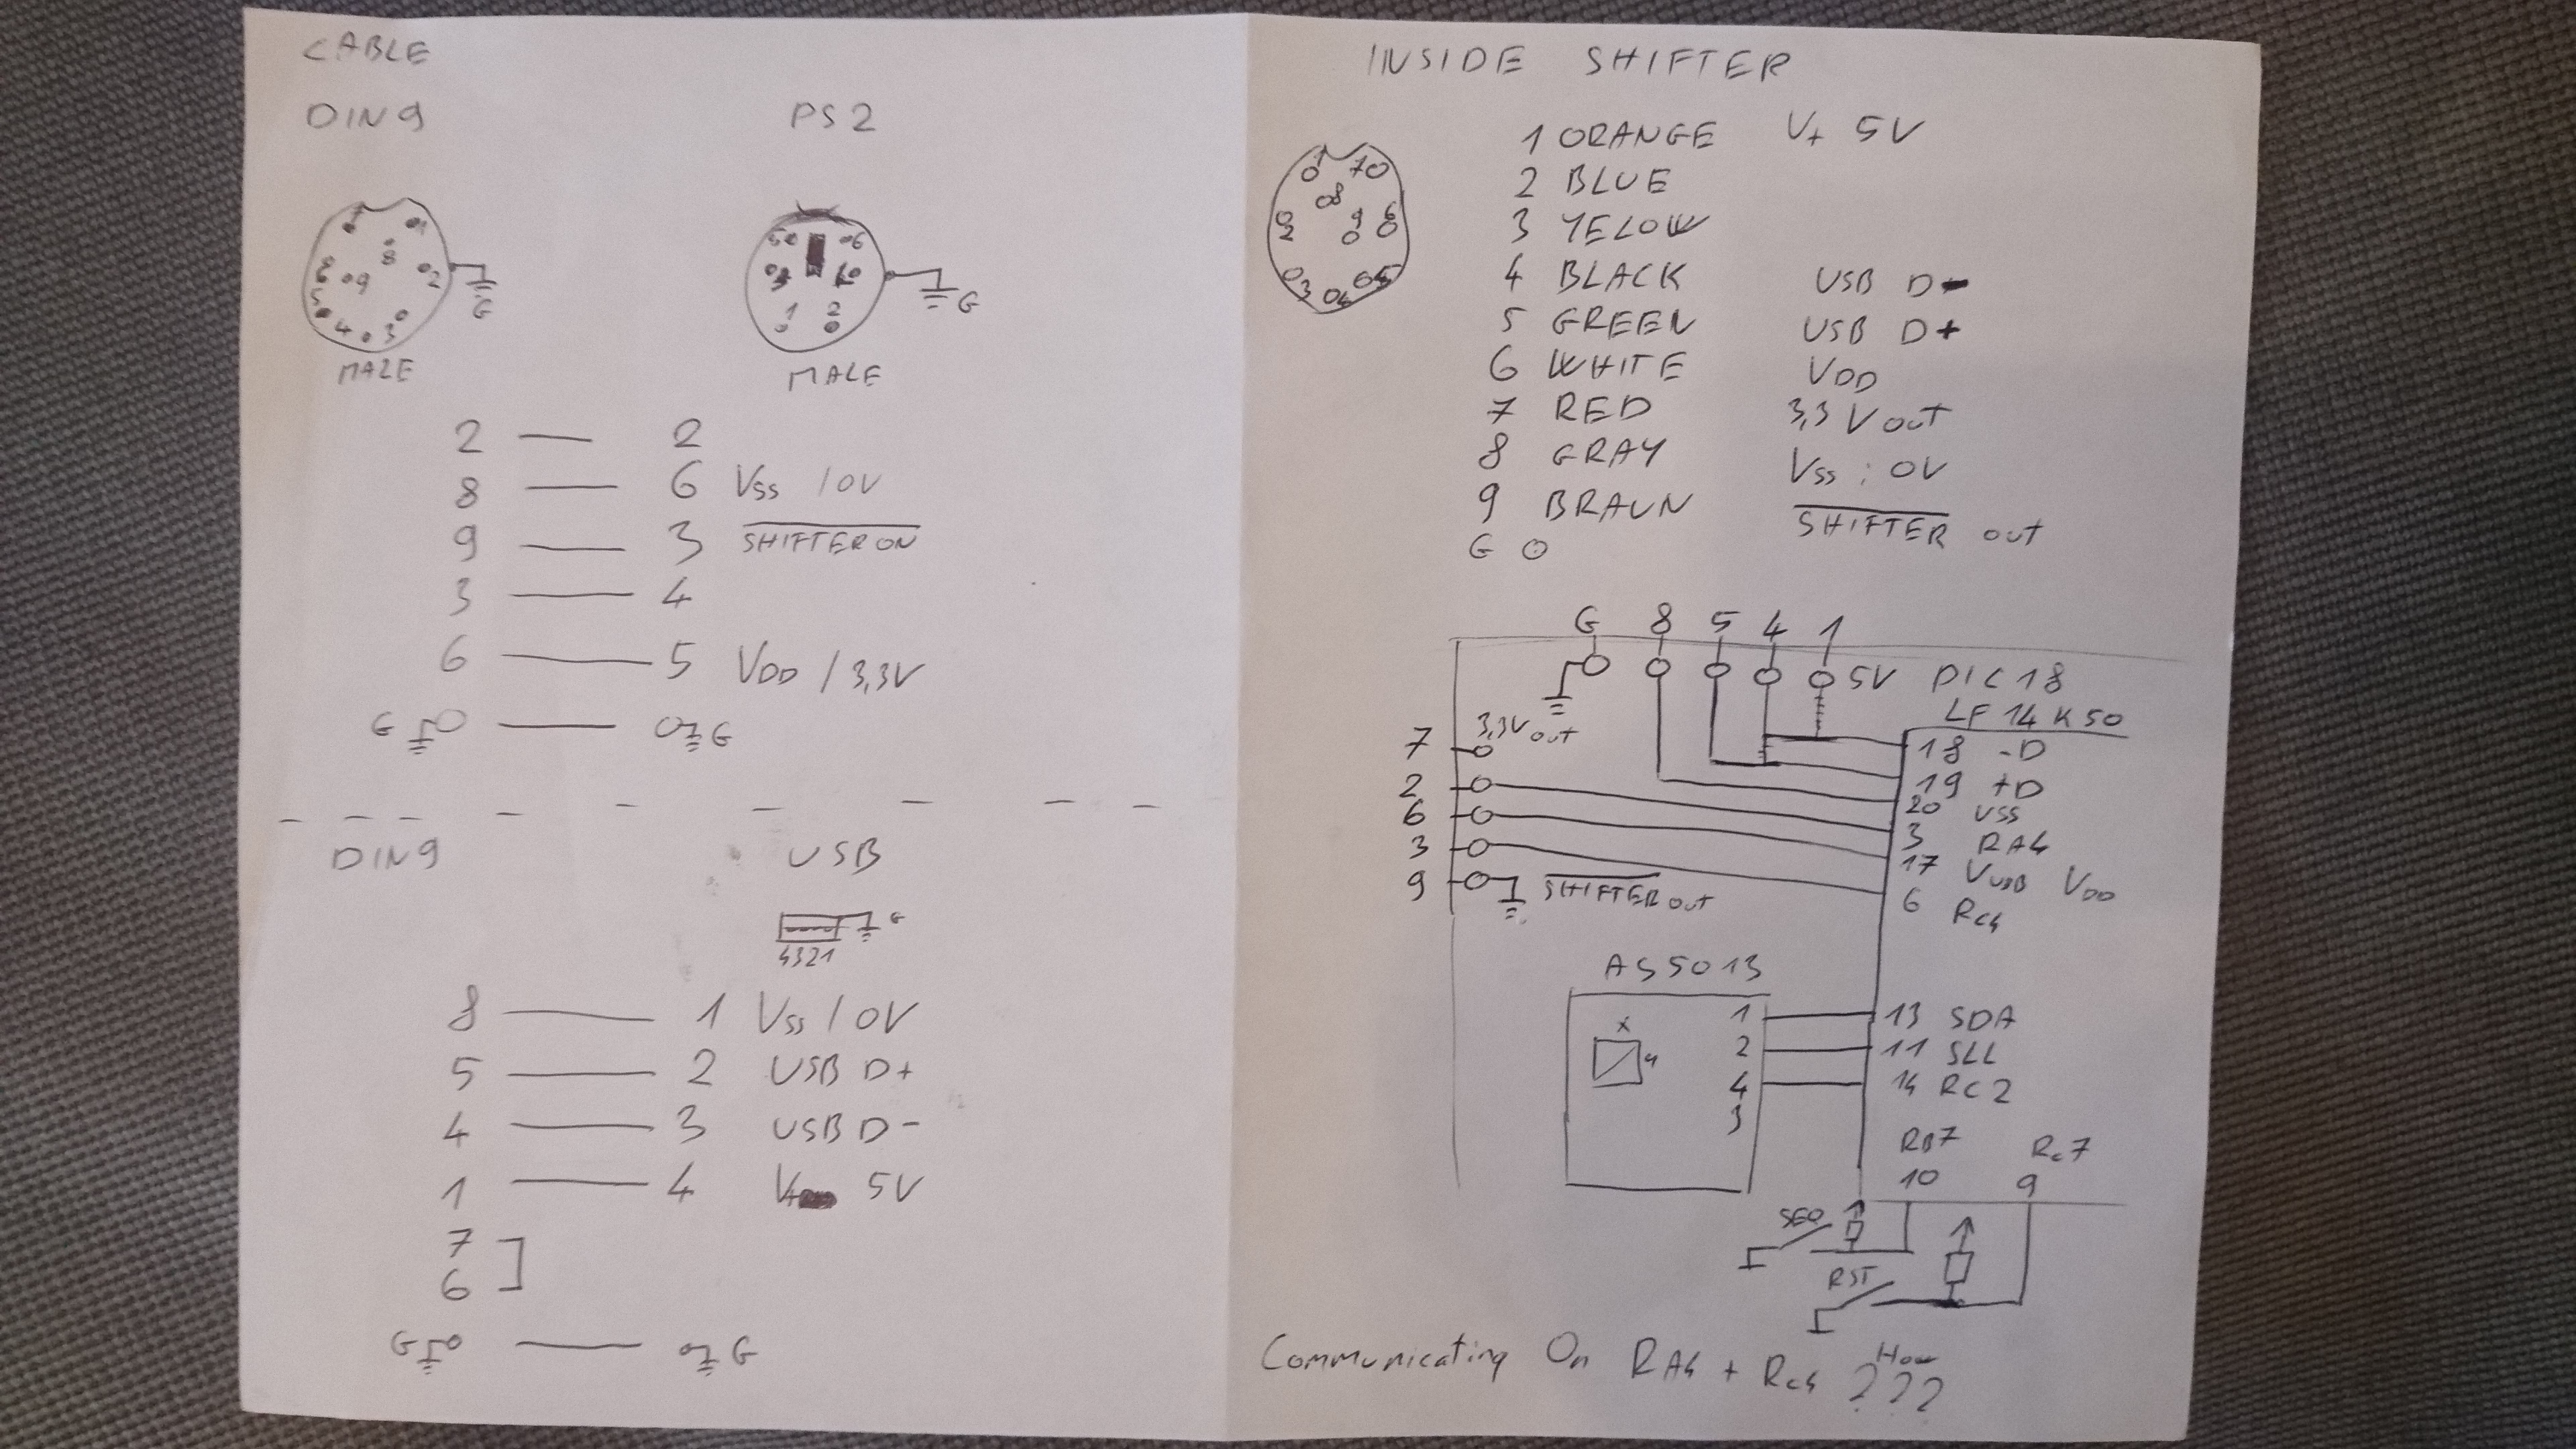 DSC_3128.JPG.1e2d4fb81227e278b94302144d8f2118 Usb To Wiring Diagram F on usb computer diagram, usb controller diagram, usb soldering diagram, usb block diagram, usb outlet adapter, usb outlets diagram, usb cable, usb wire connections, usb schematic diagram, usb connectors diagram, usb switch, usb pinout, usb splitter diagram, circuit diagram, usb strip, usb color diagram, usb socket diagram, usb wire schematic, usb motherboard diagram, usb charging diagram,